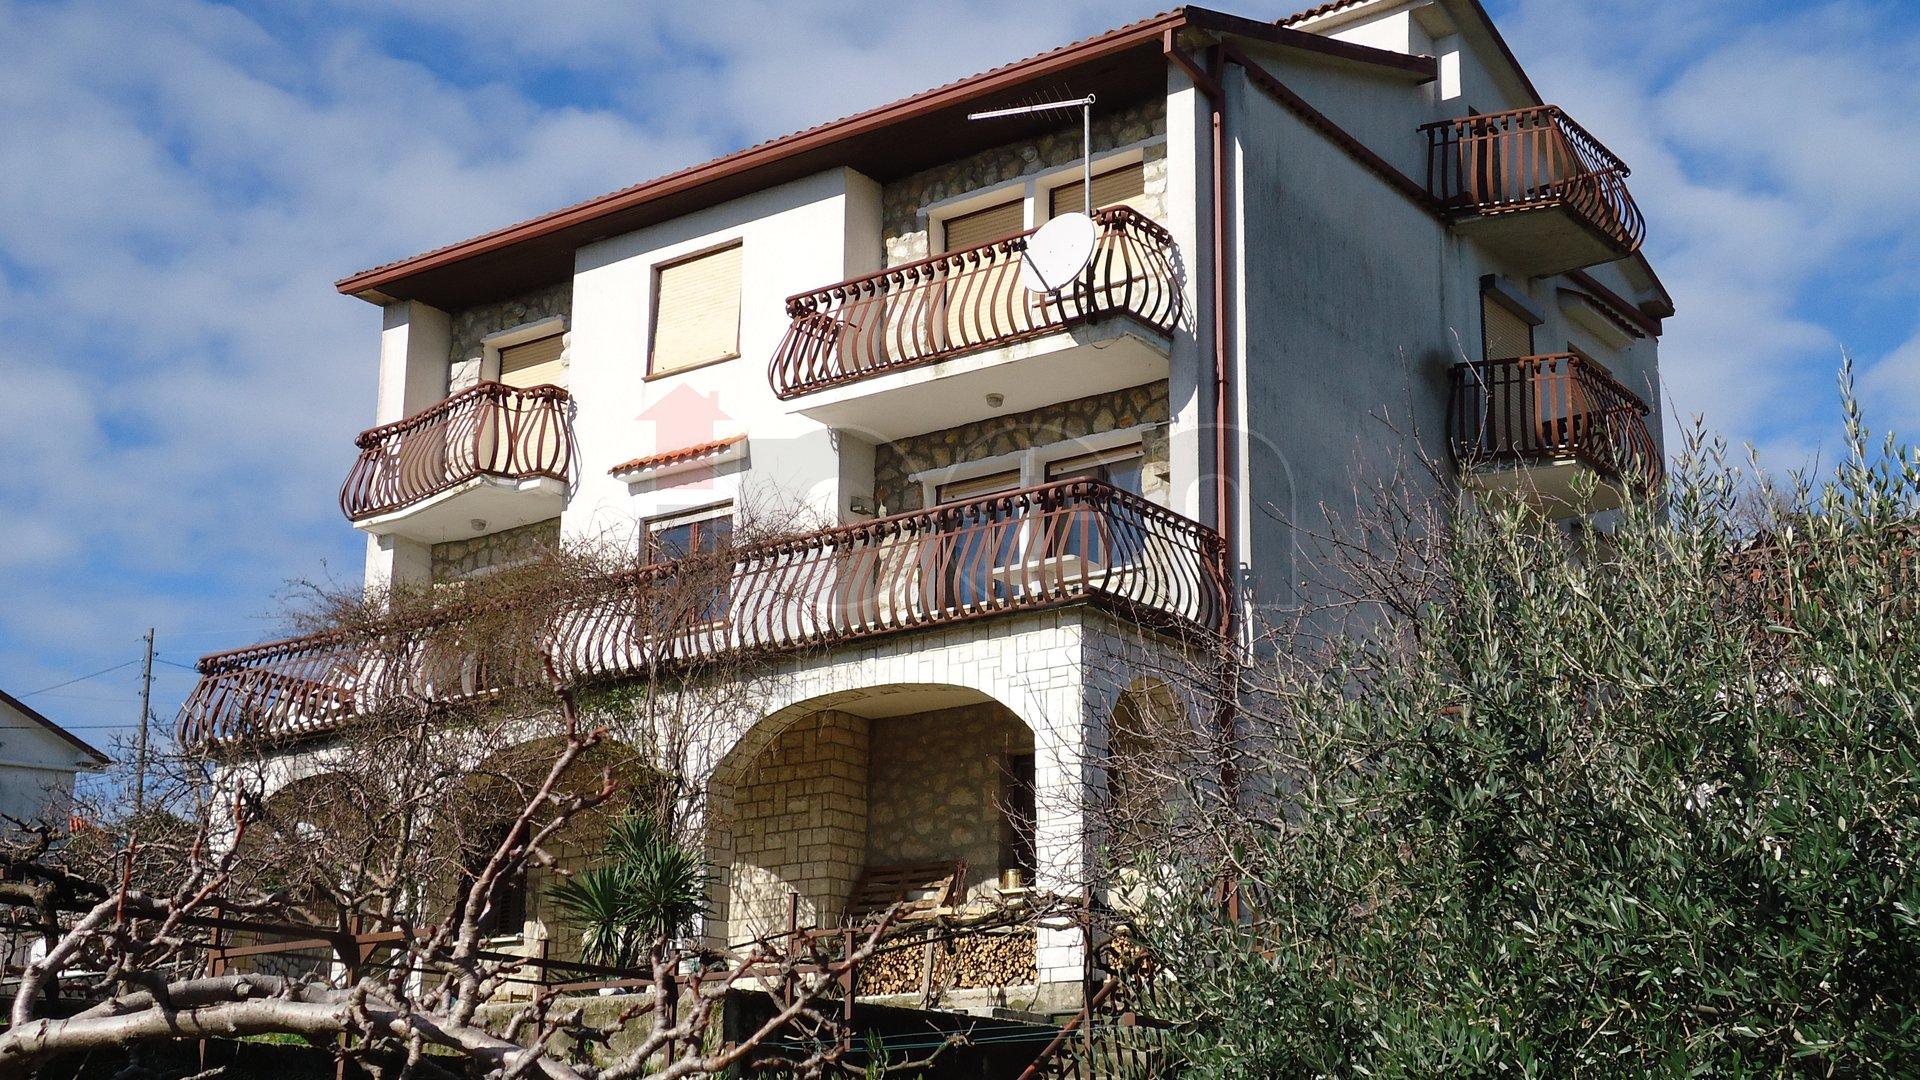 Casa, 550 m2, Vendita, Rijeka - Marinići